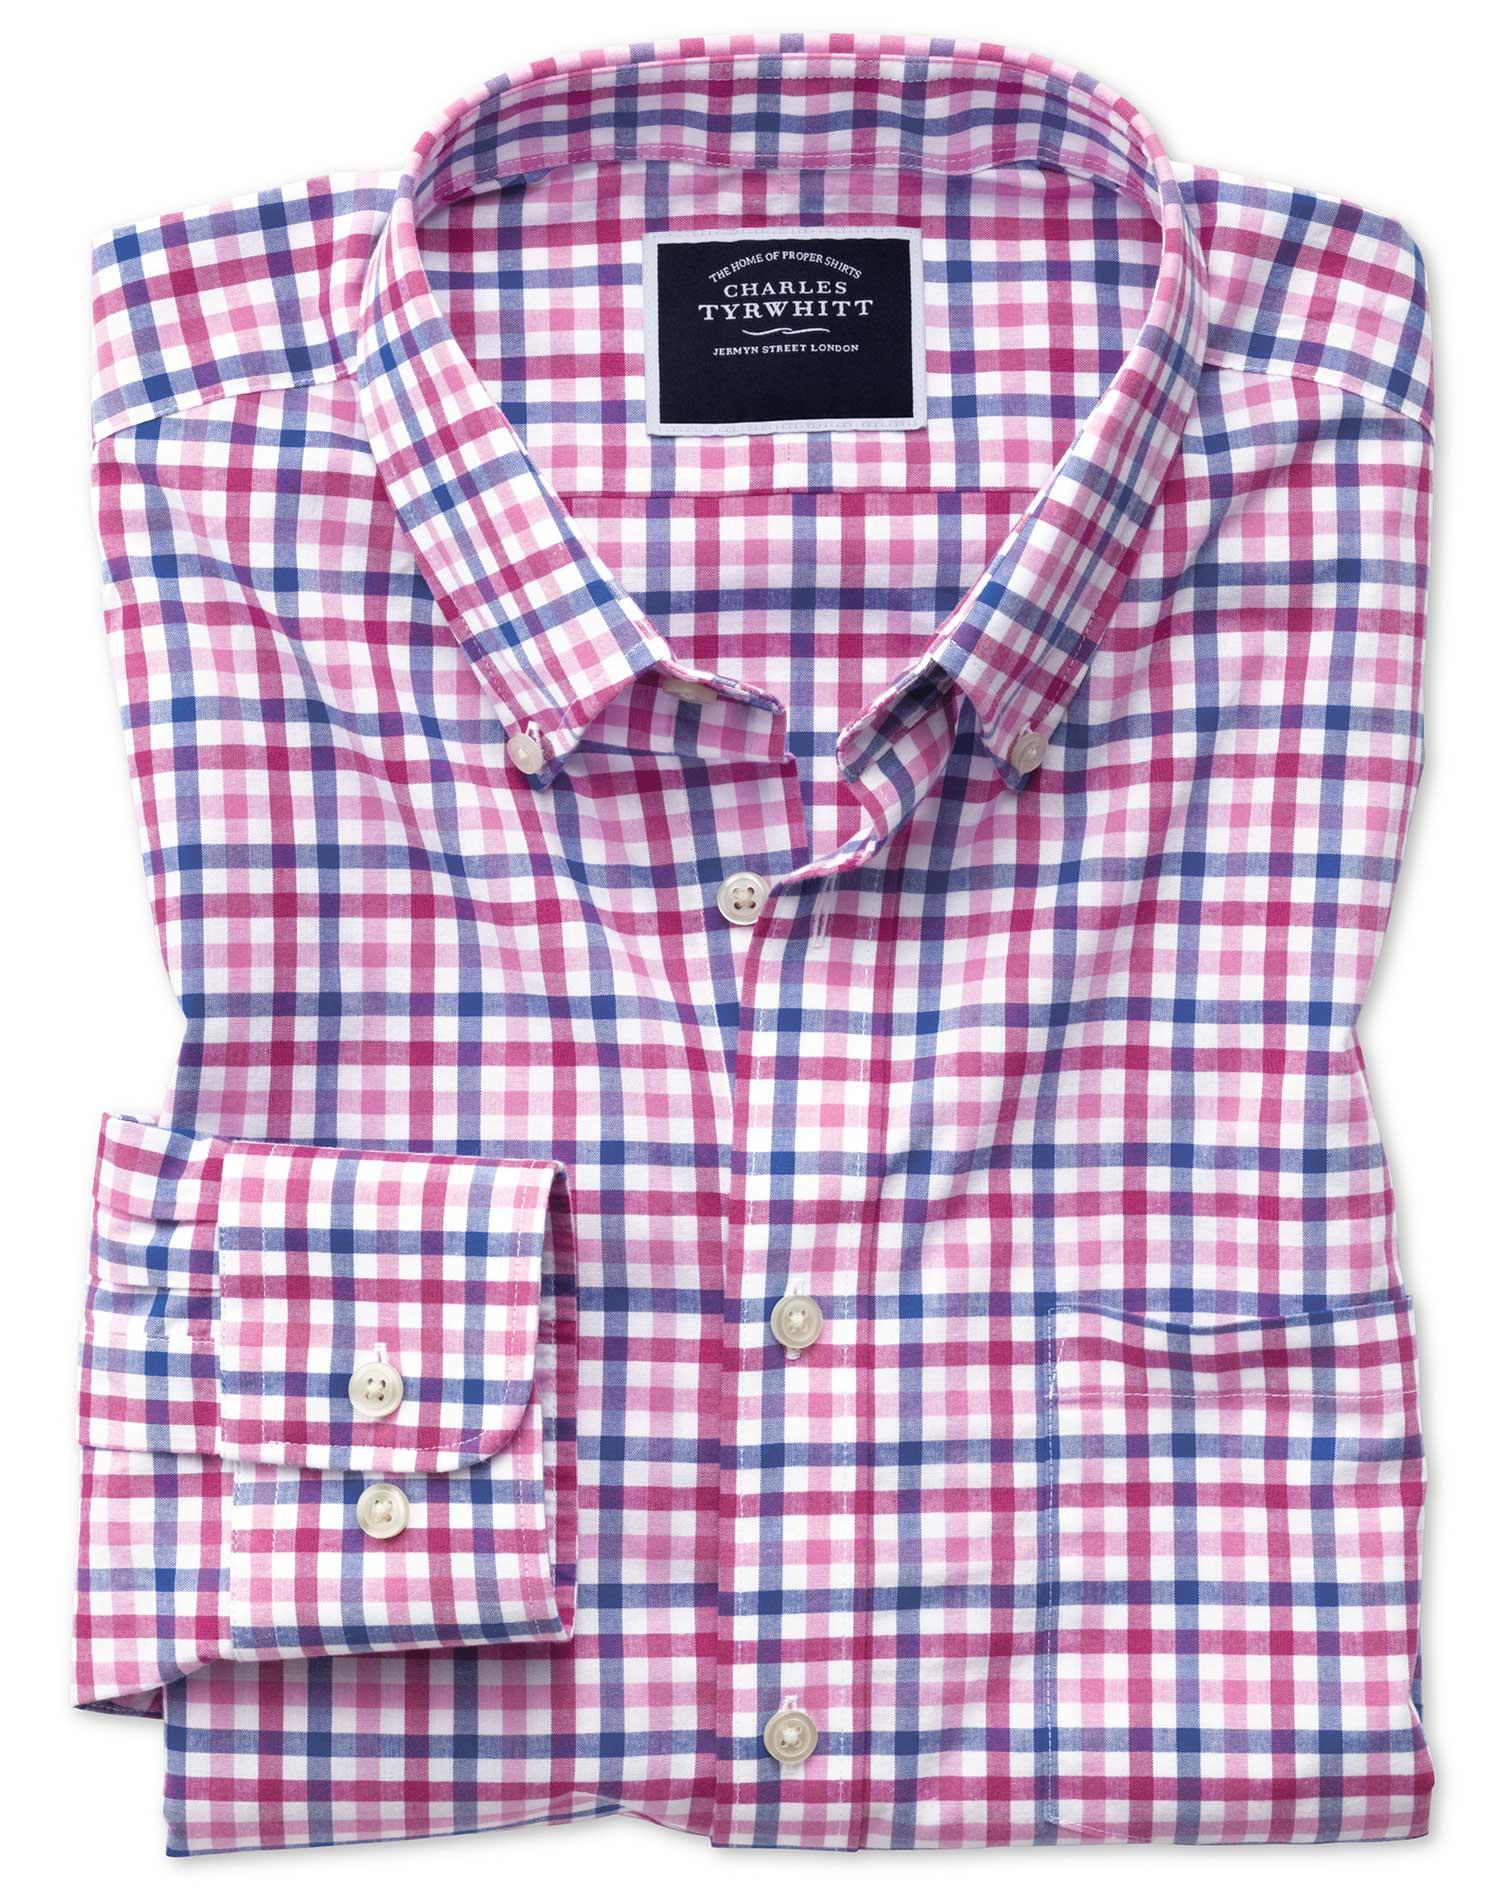 Classic Fit Poplin Pink Multi Gingham Cotton Shirt Single Cuff Size XXXL by Charles Tyrwhitt